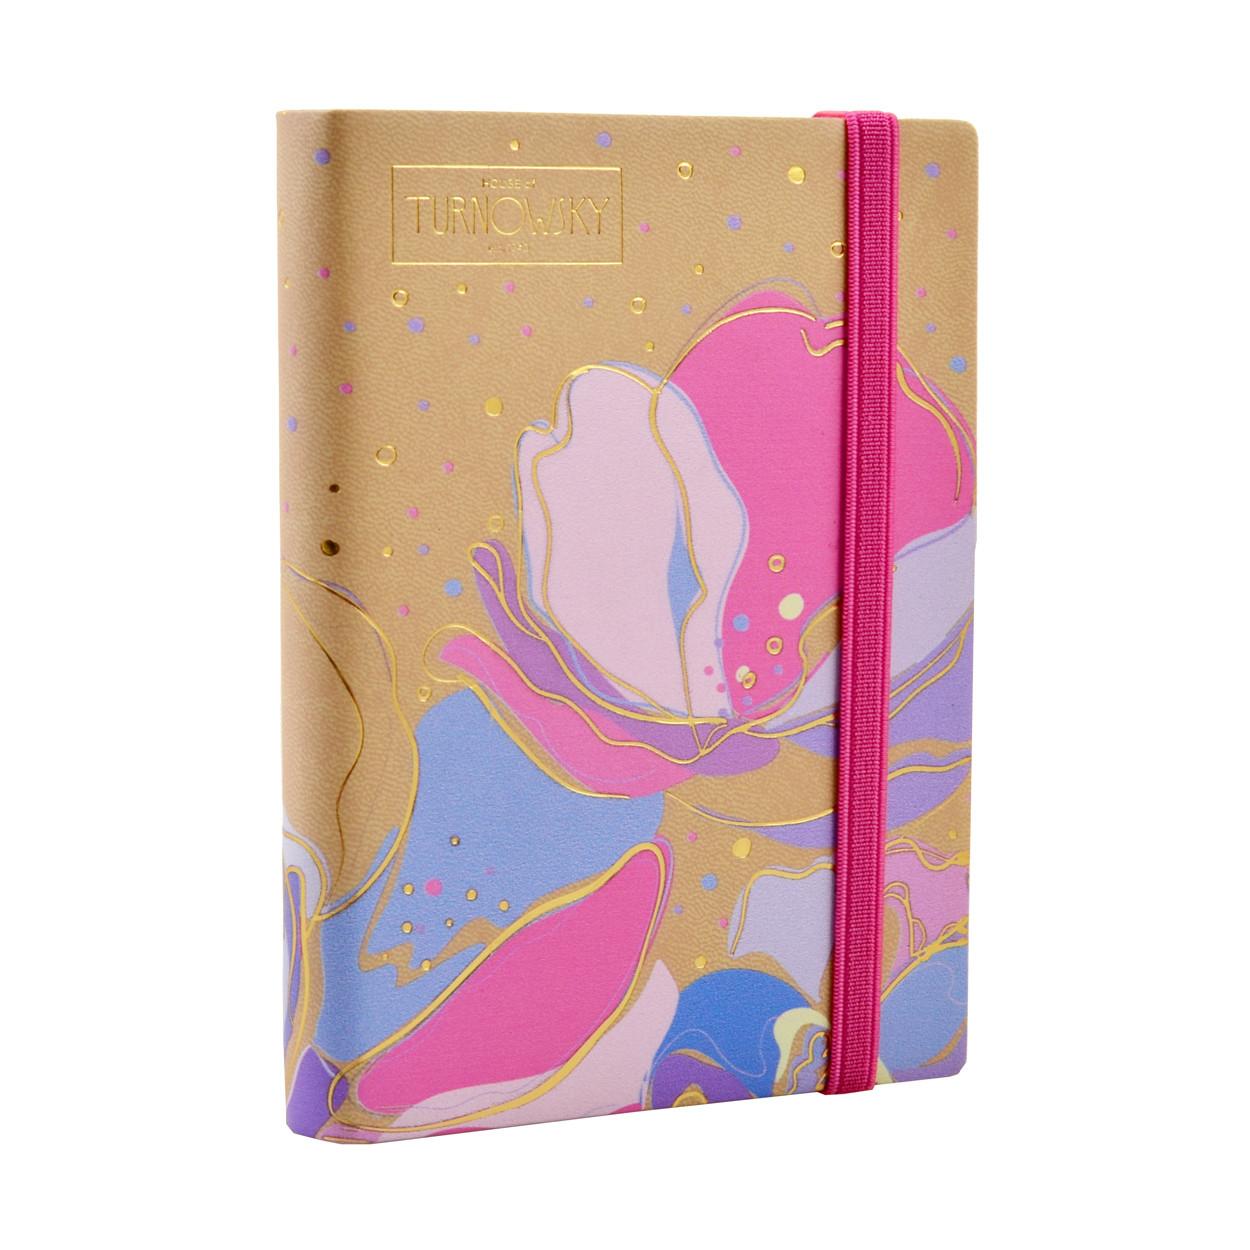 Ежедневник с мягкой обложкой YES А6 недат. Viola 352 стр. код:251995